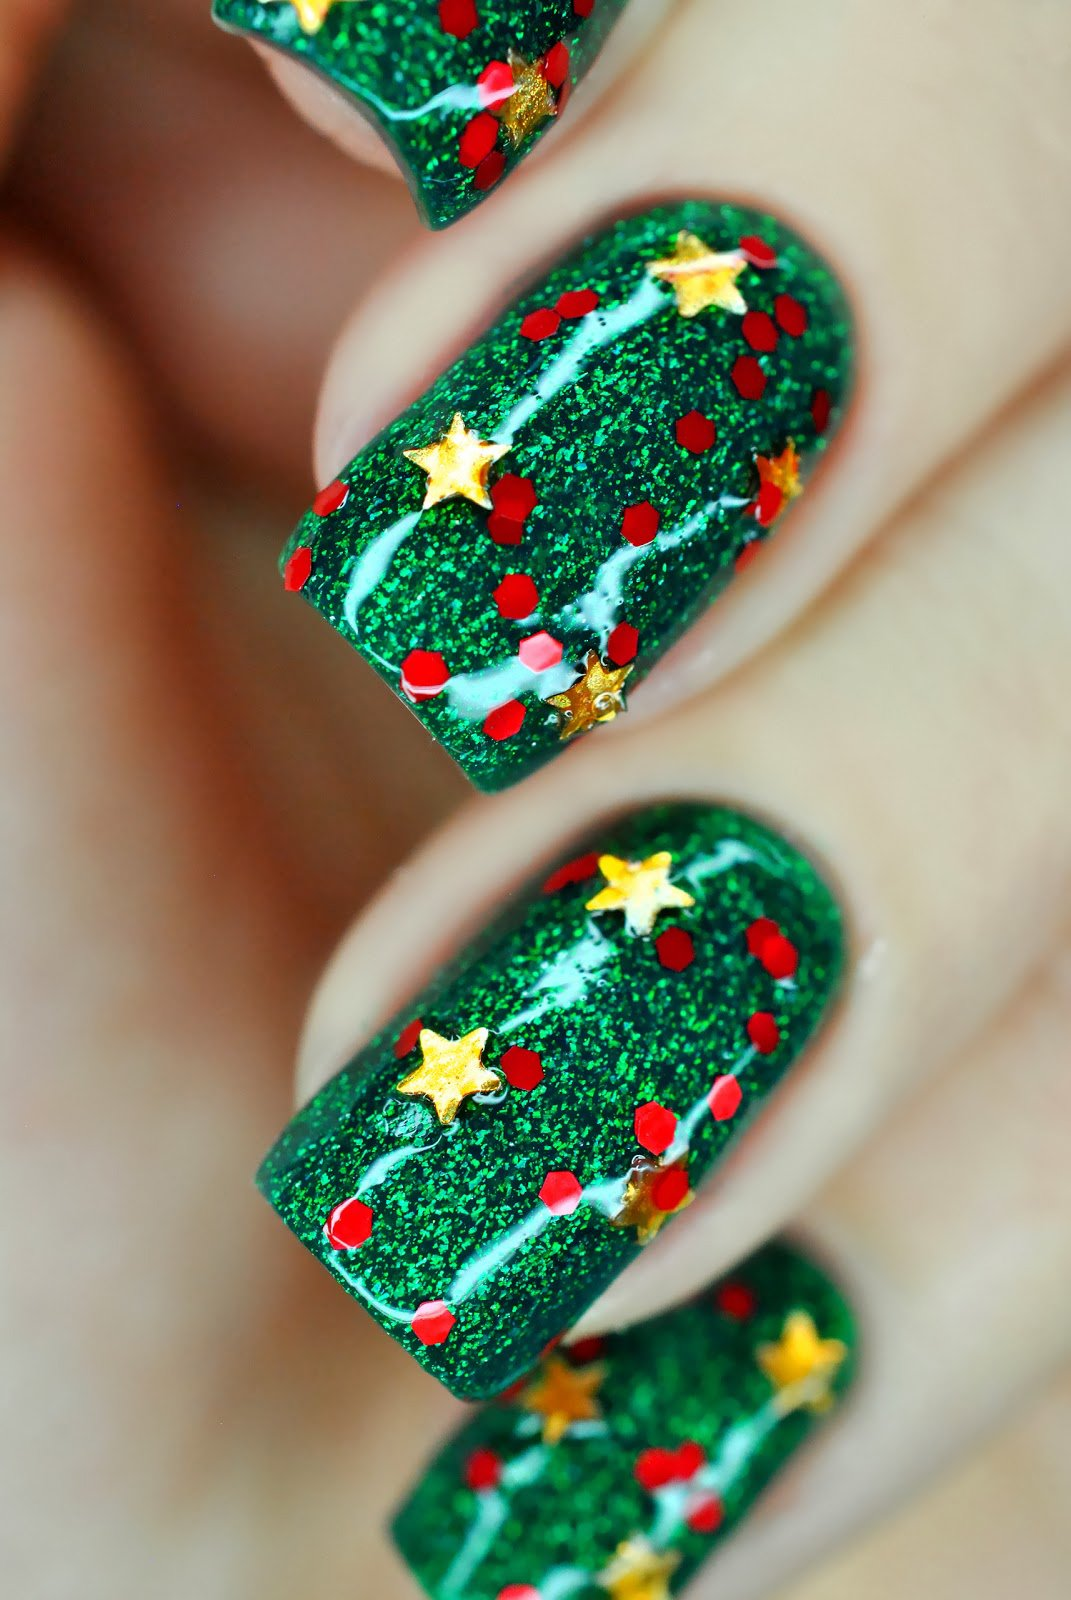 15 diseños navideños de uñas que te harán lucir genial